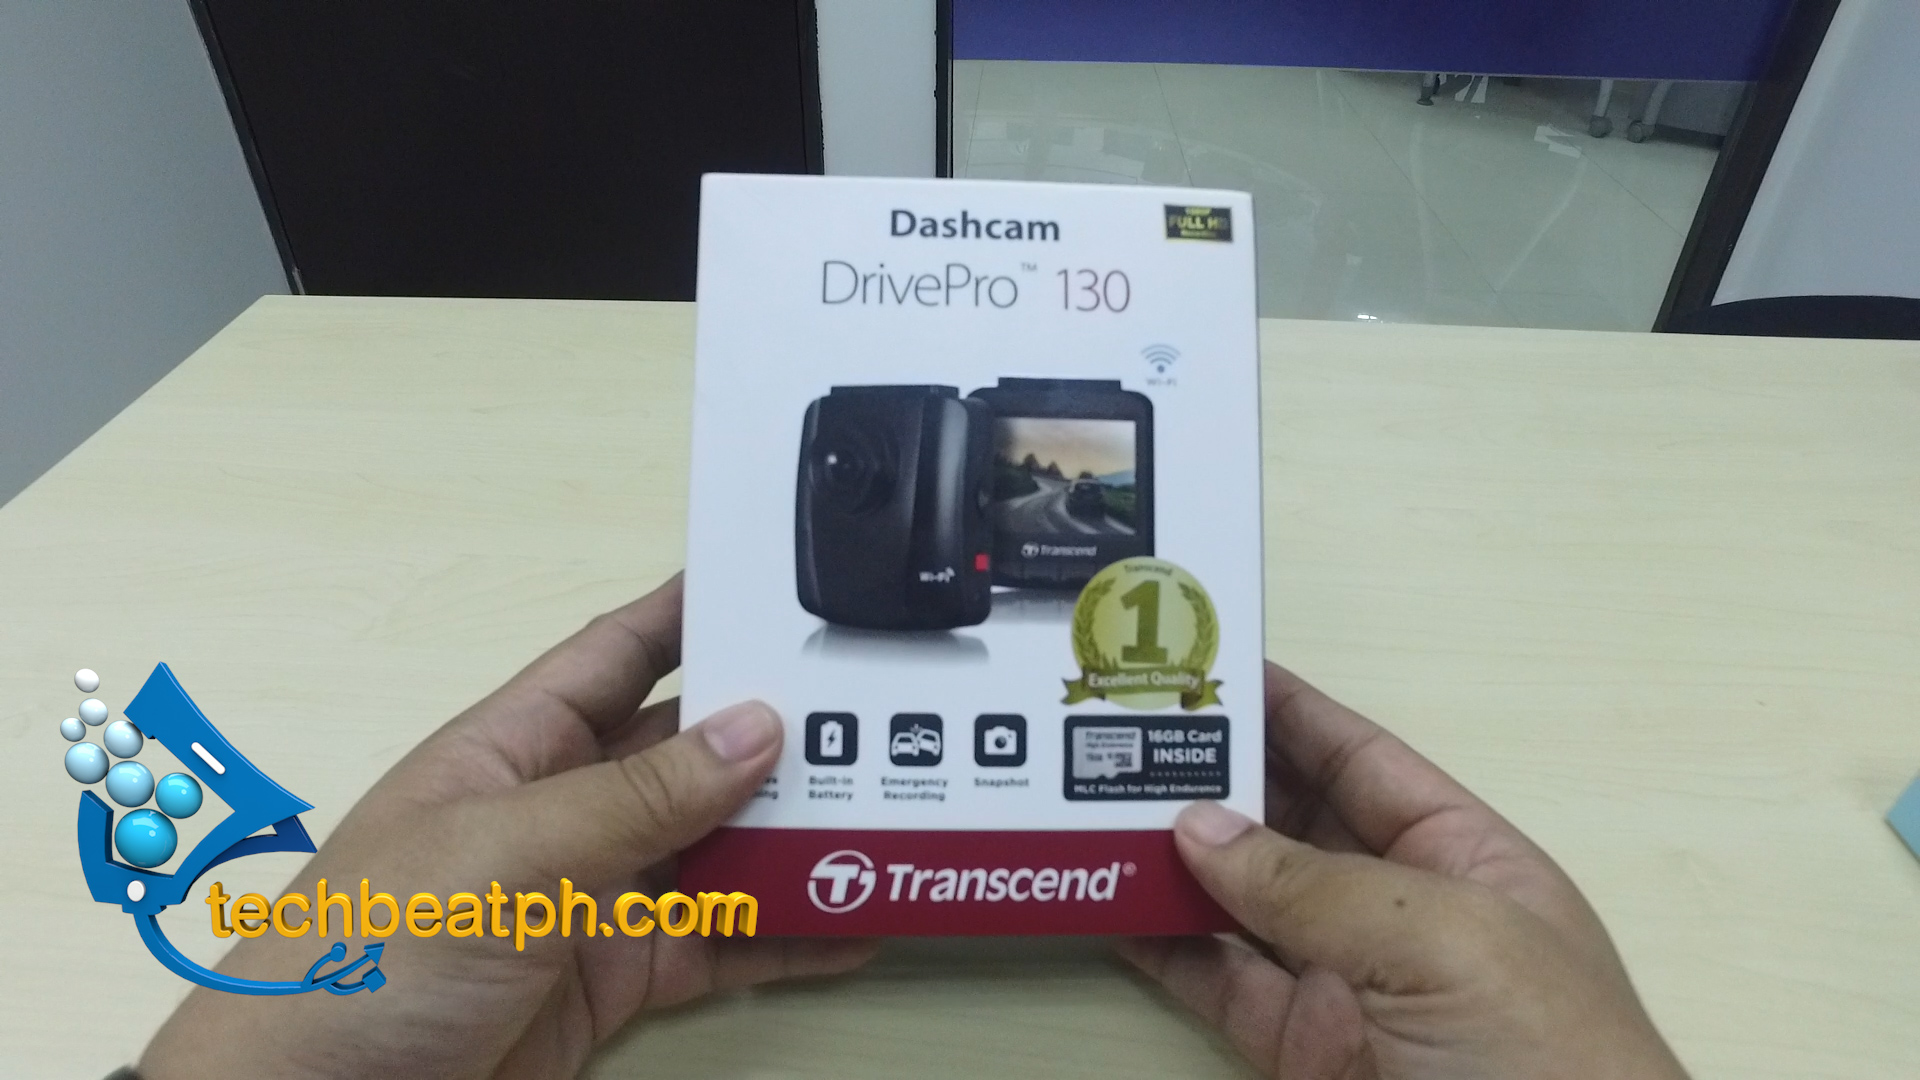 Transcend Dashcam Drive Pro 130